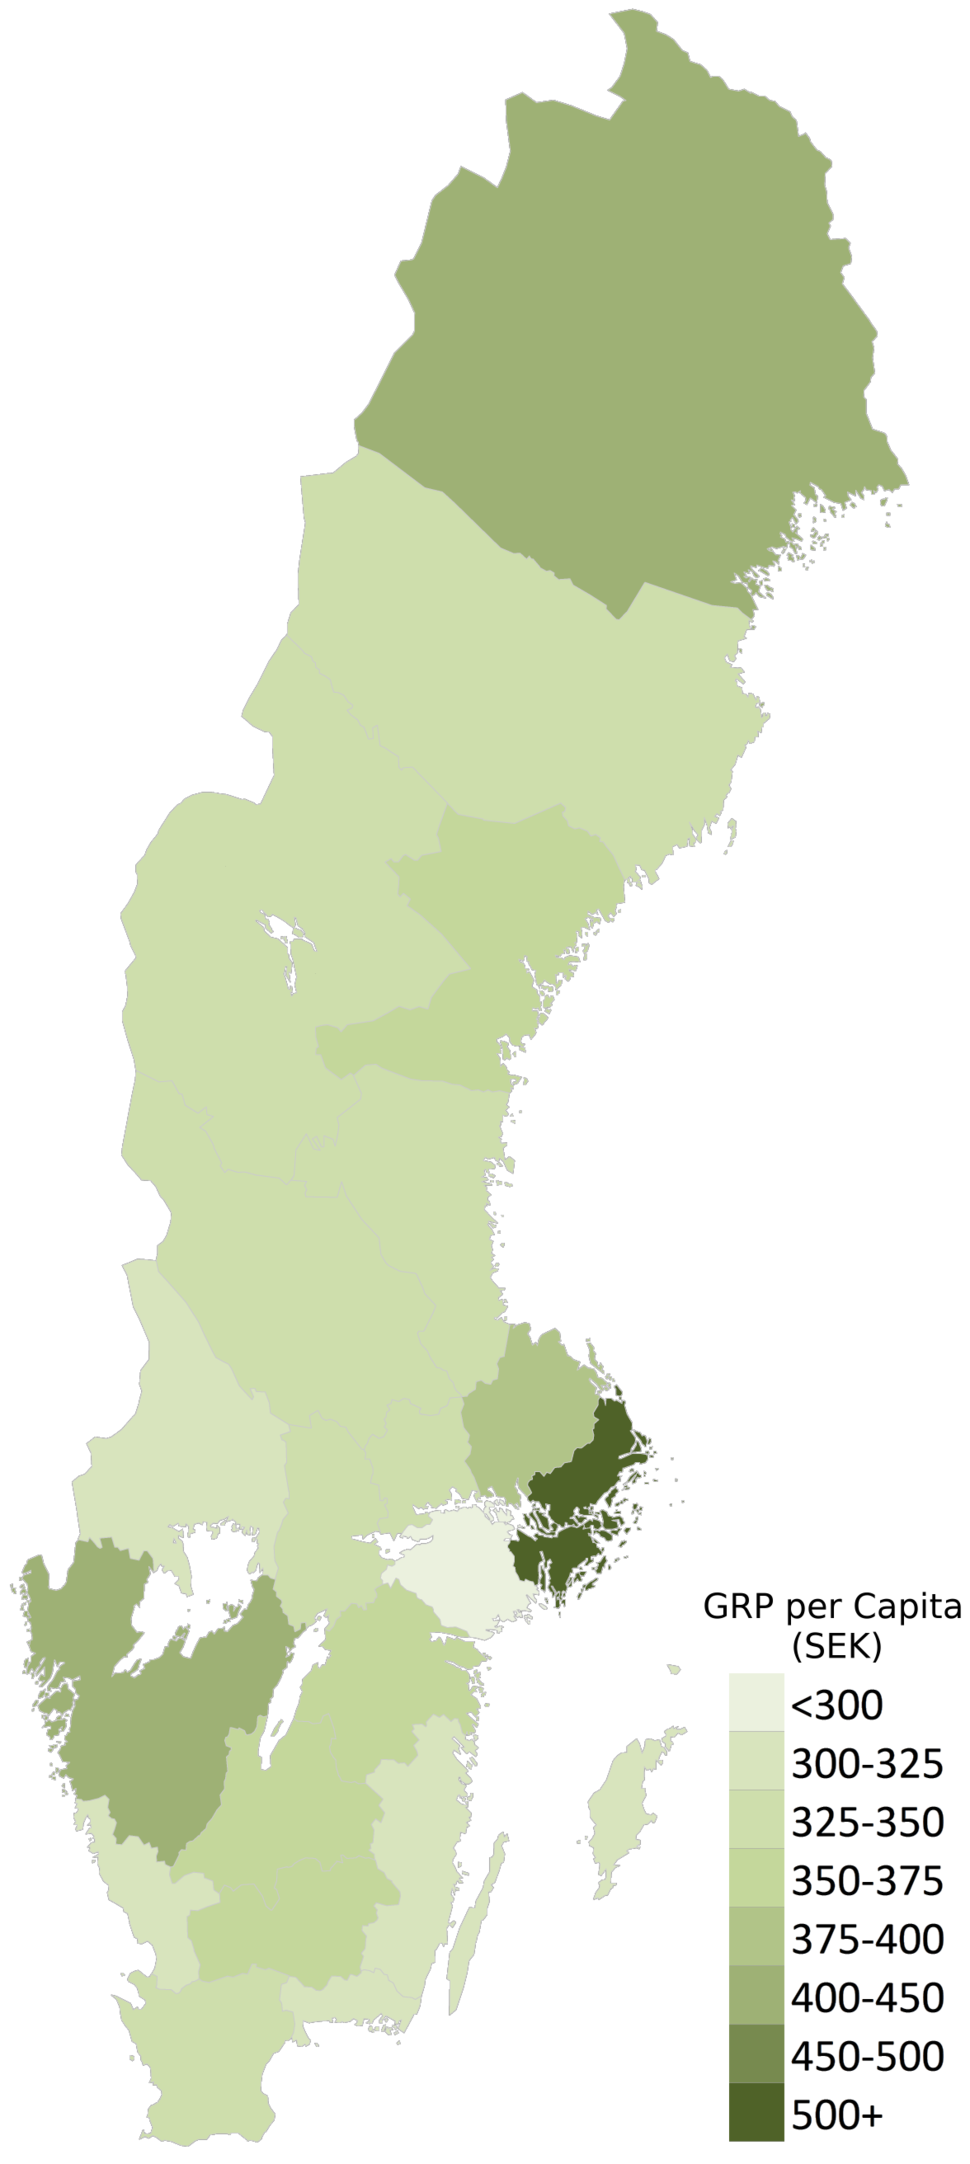 Sweden GRP per Capita (2014)